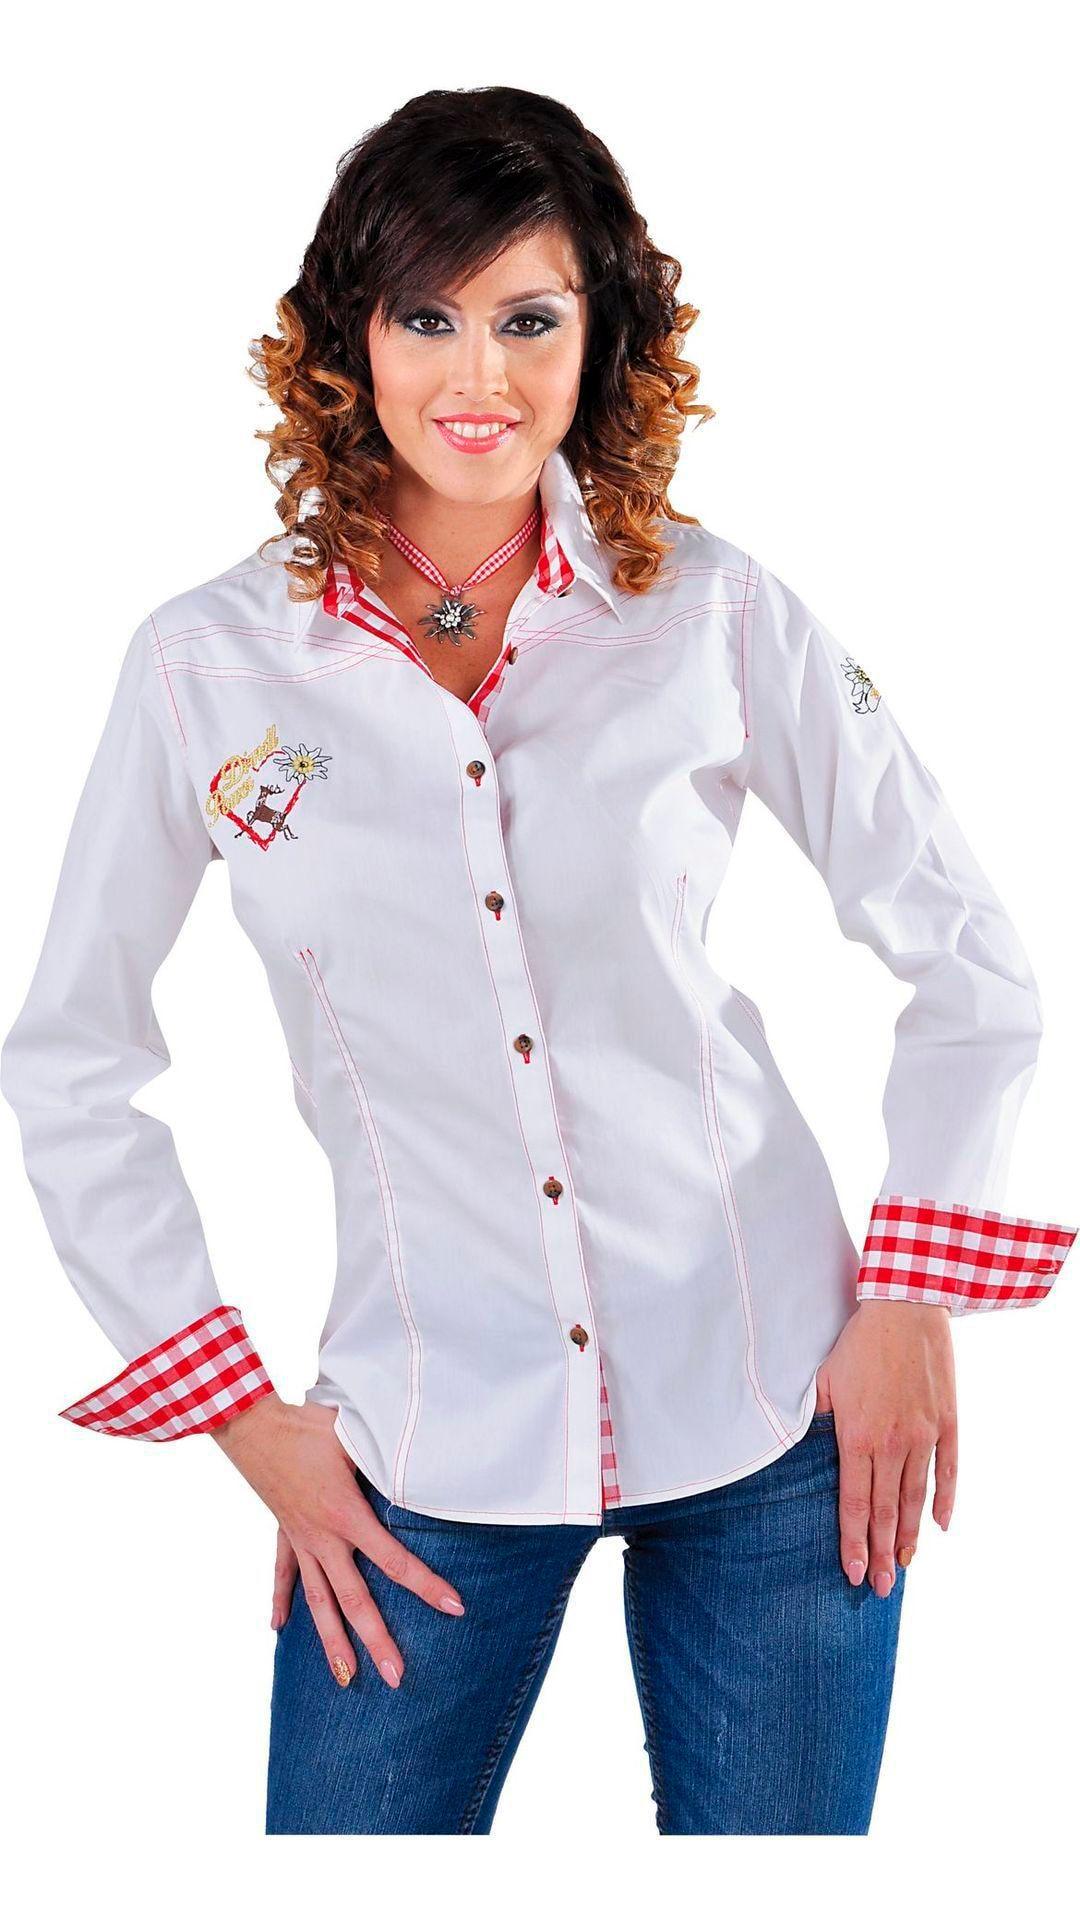 Witte oktoberfest blouse vrouw